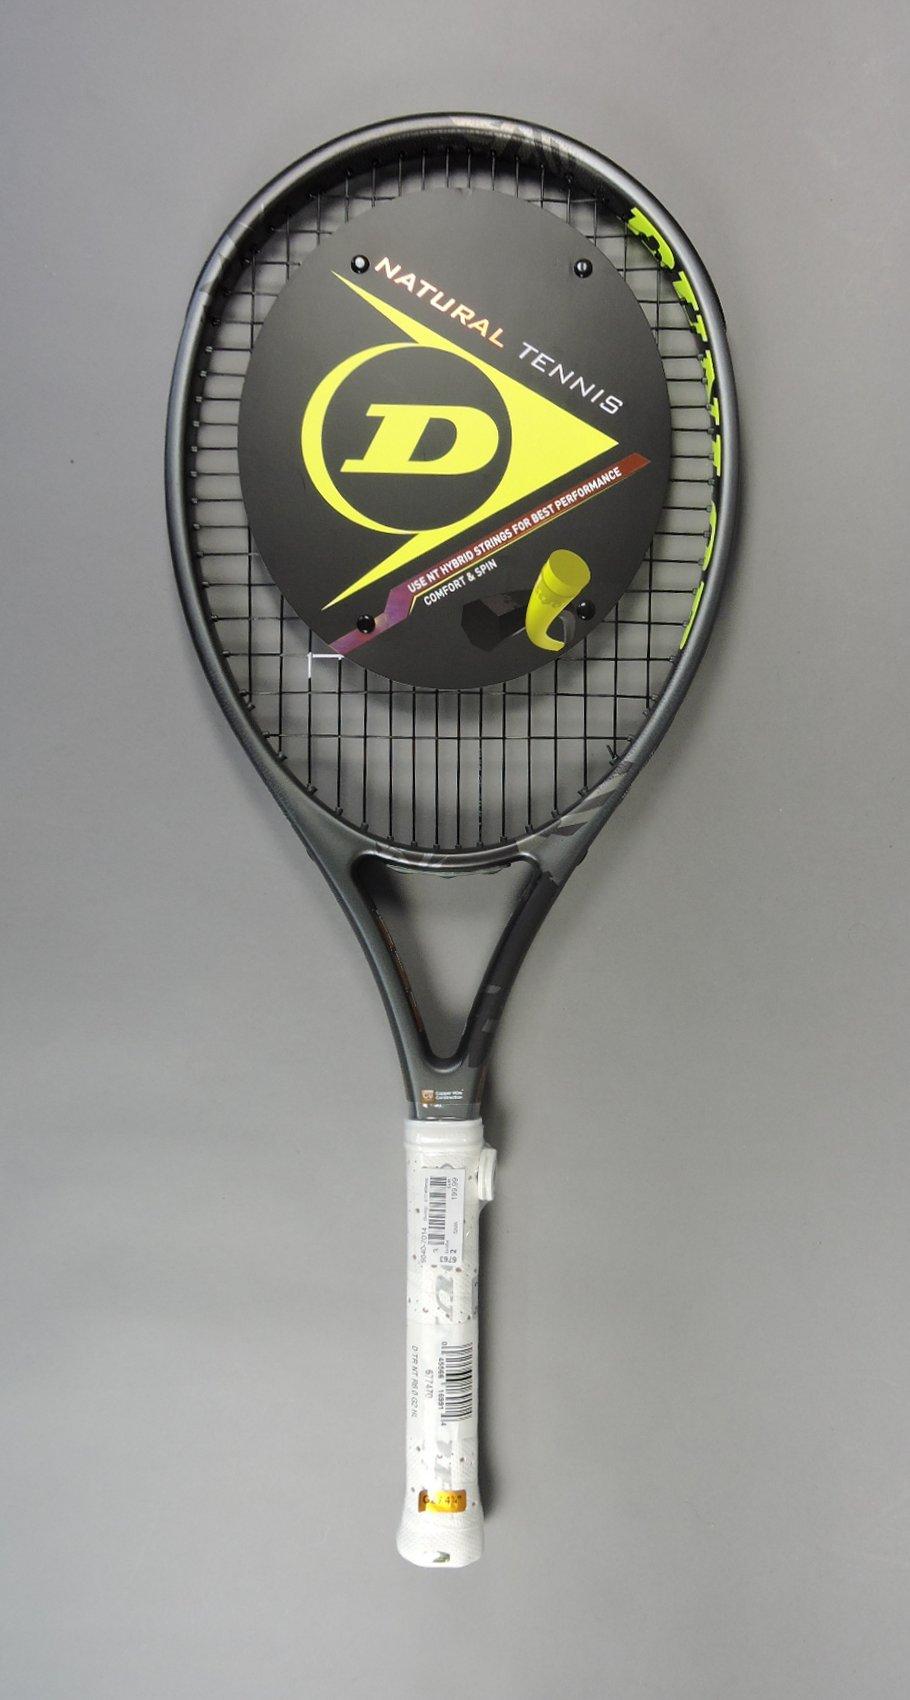 Dunlop NT R 6.0